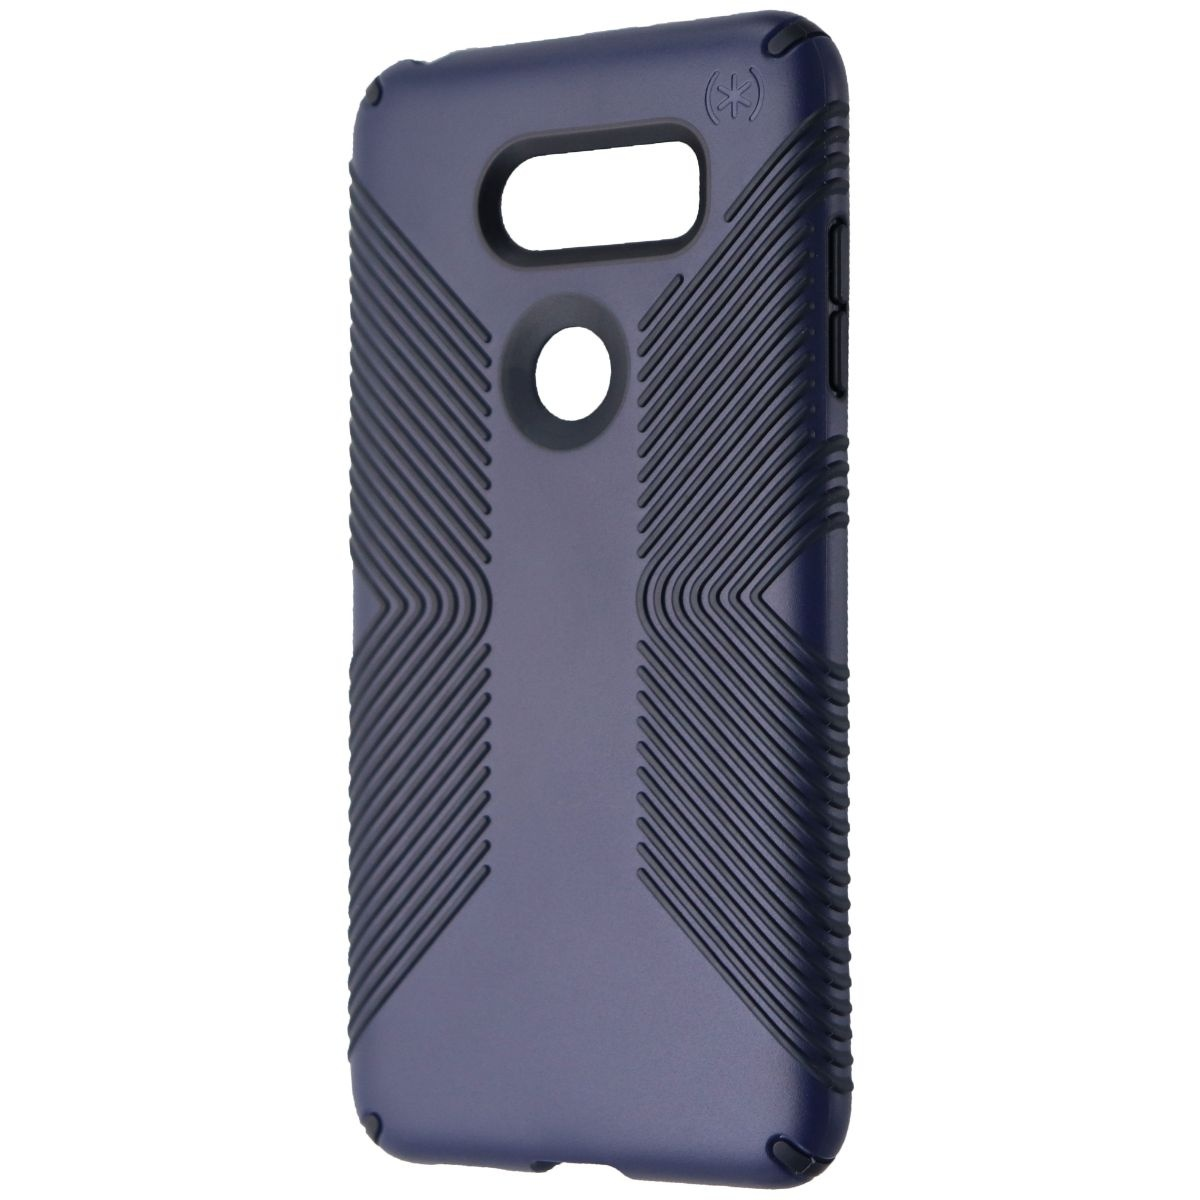 Speck Presidio Grip Phone Case for LG V30 - Eclipse Blue / Carbon Black